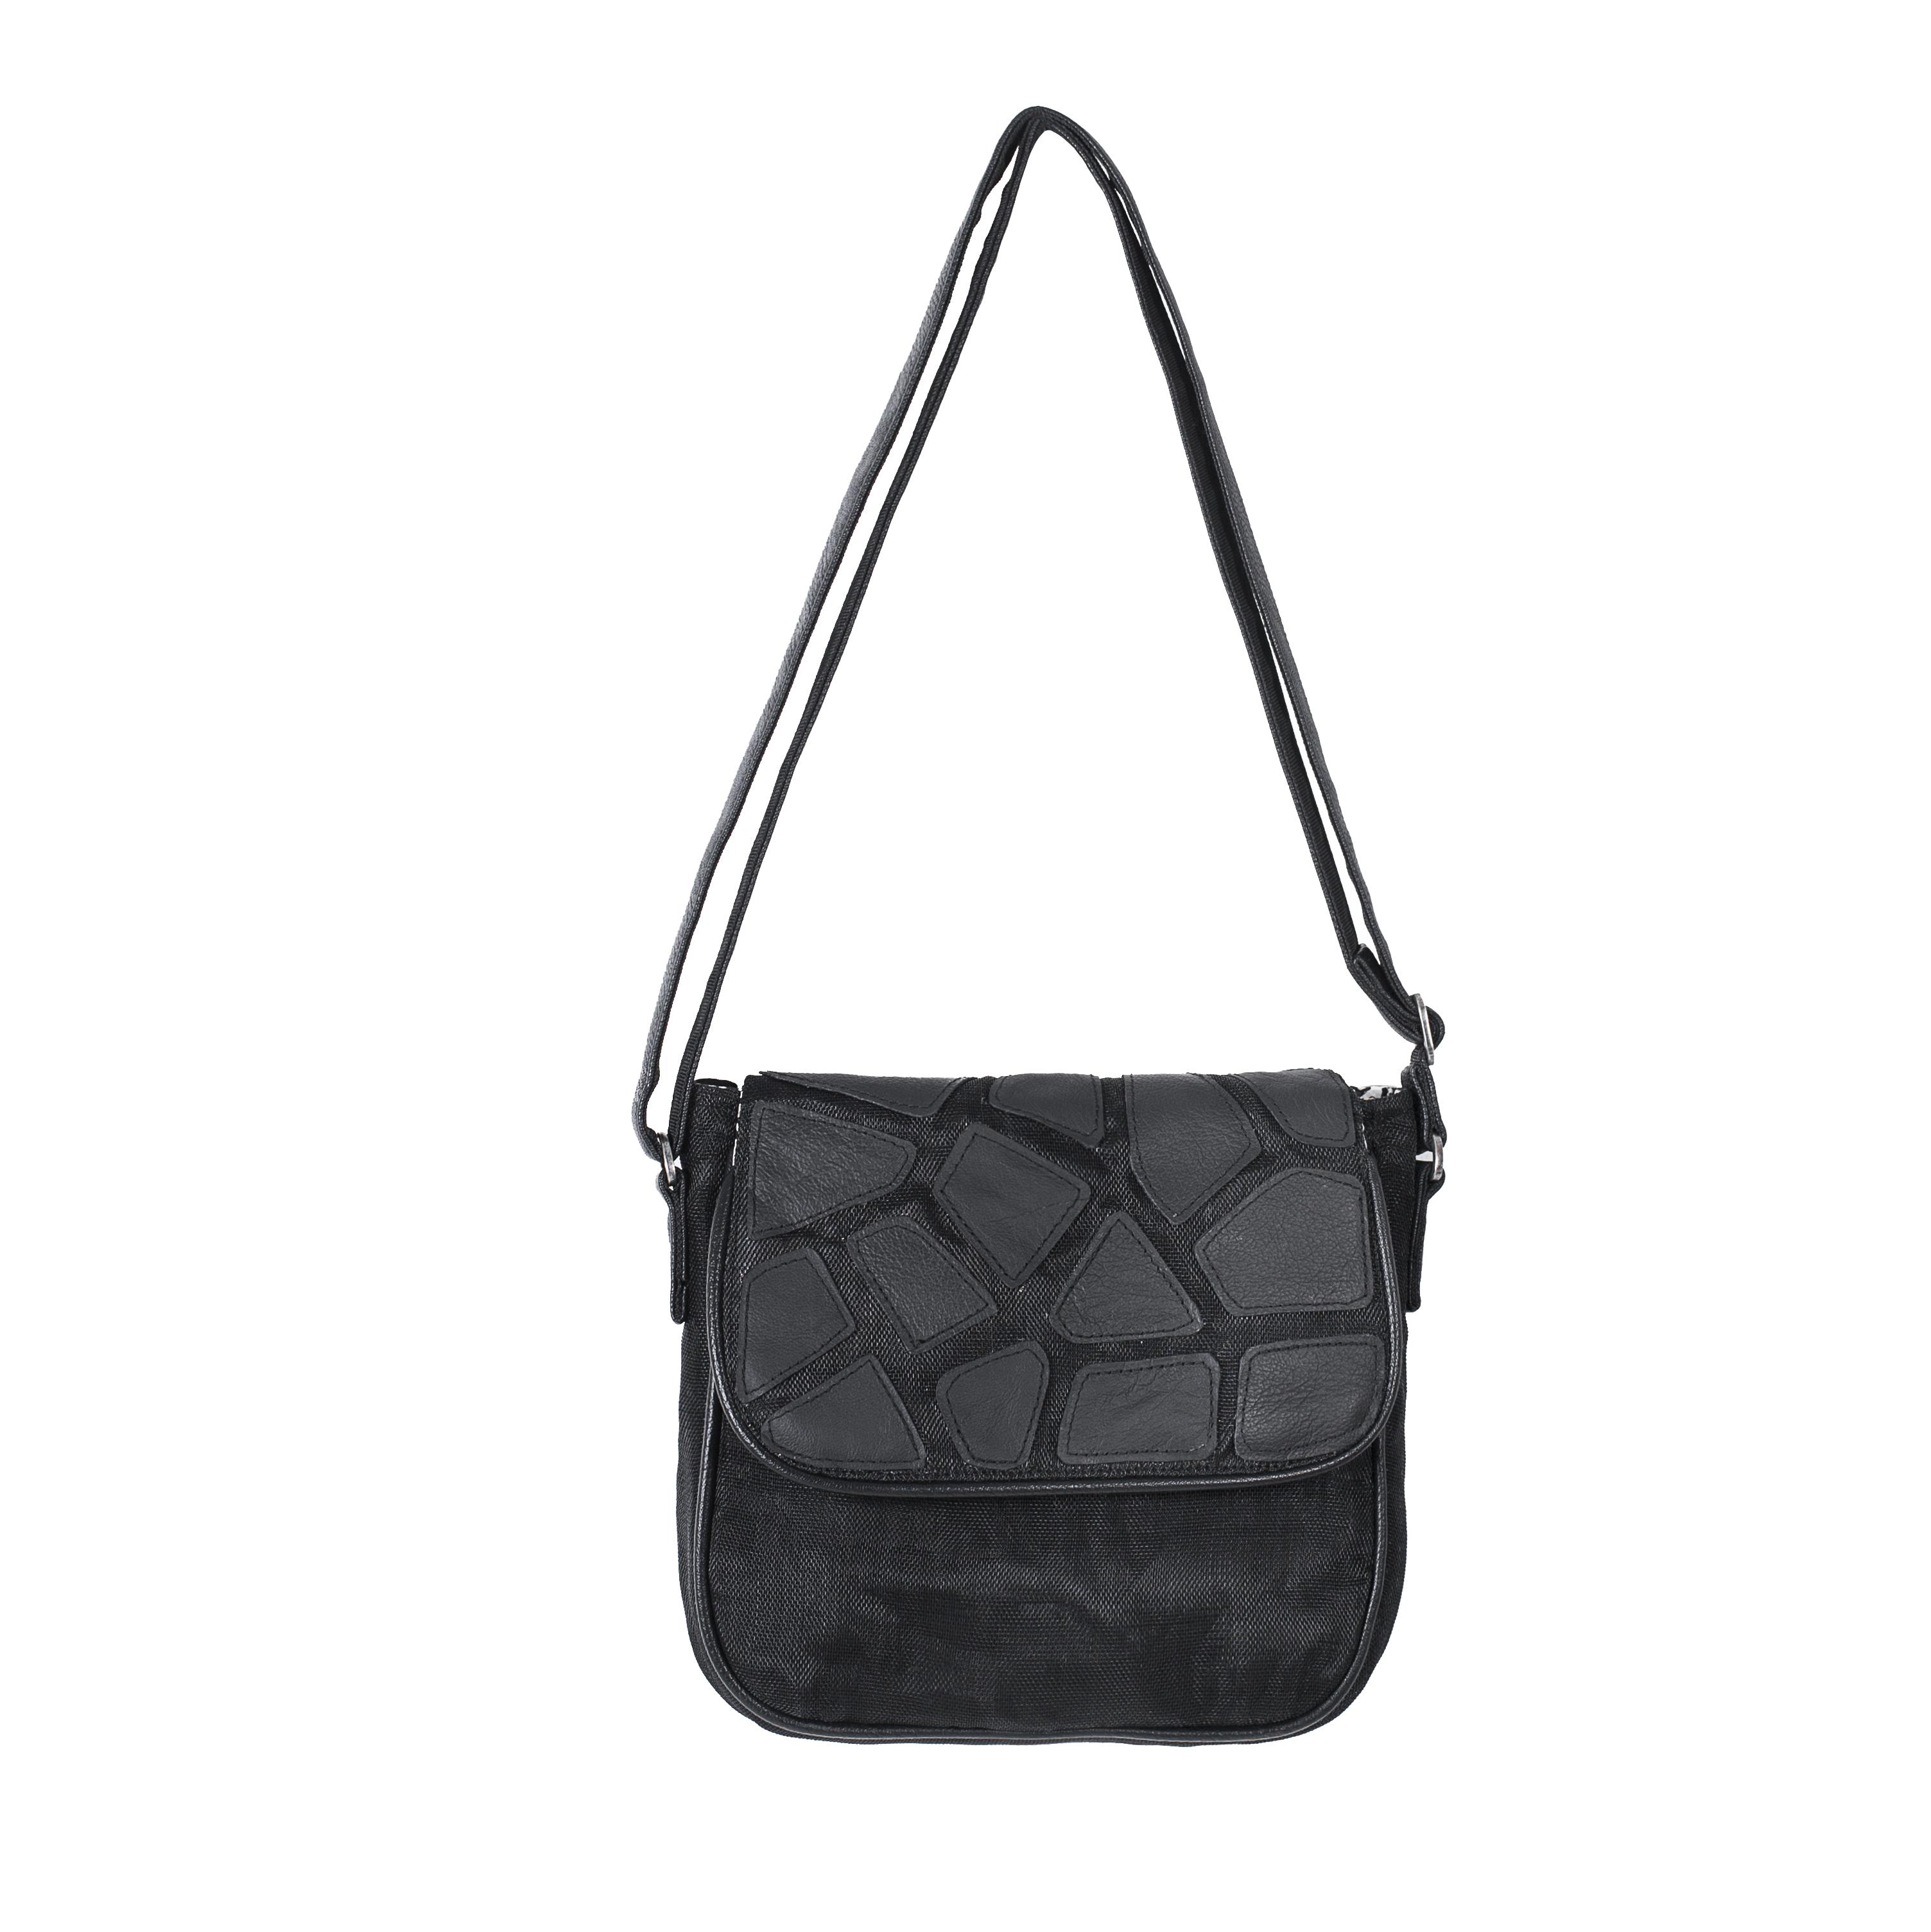 Square - Eco-friendly Leather Bag - Black